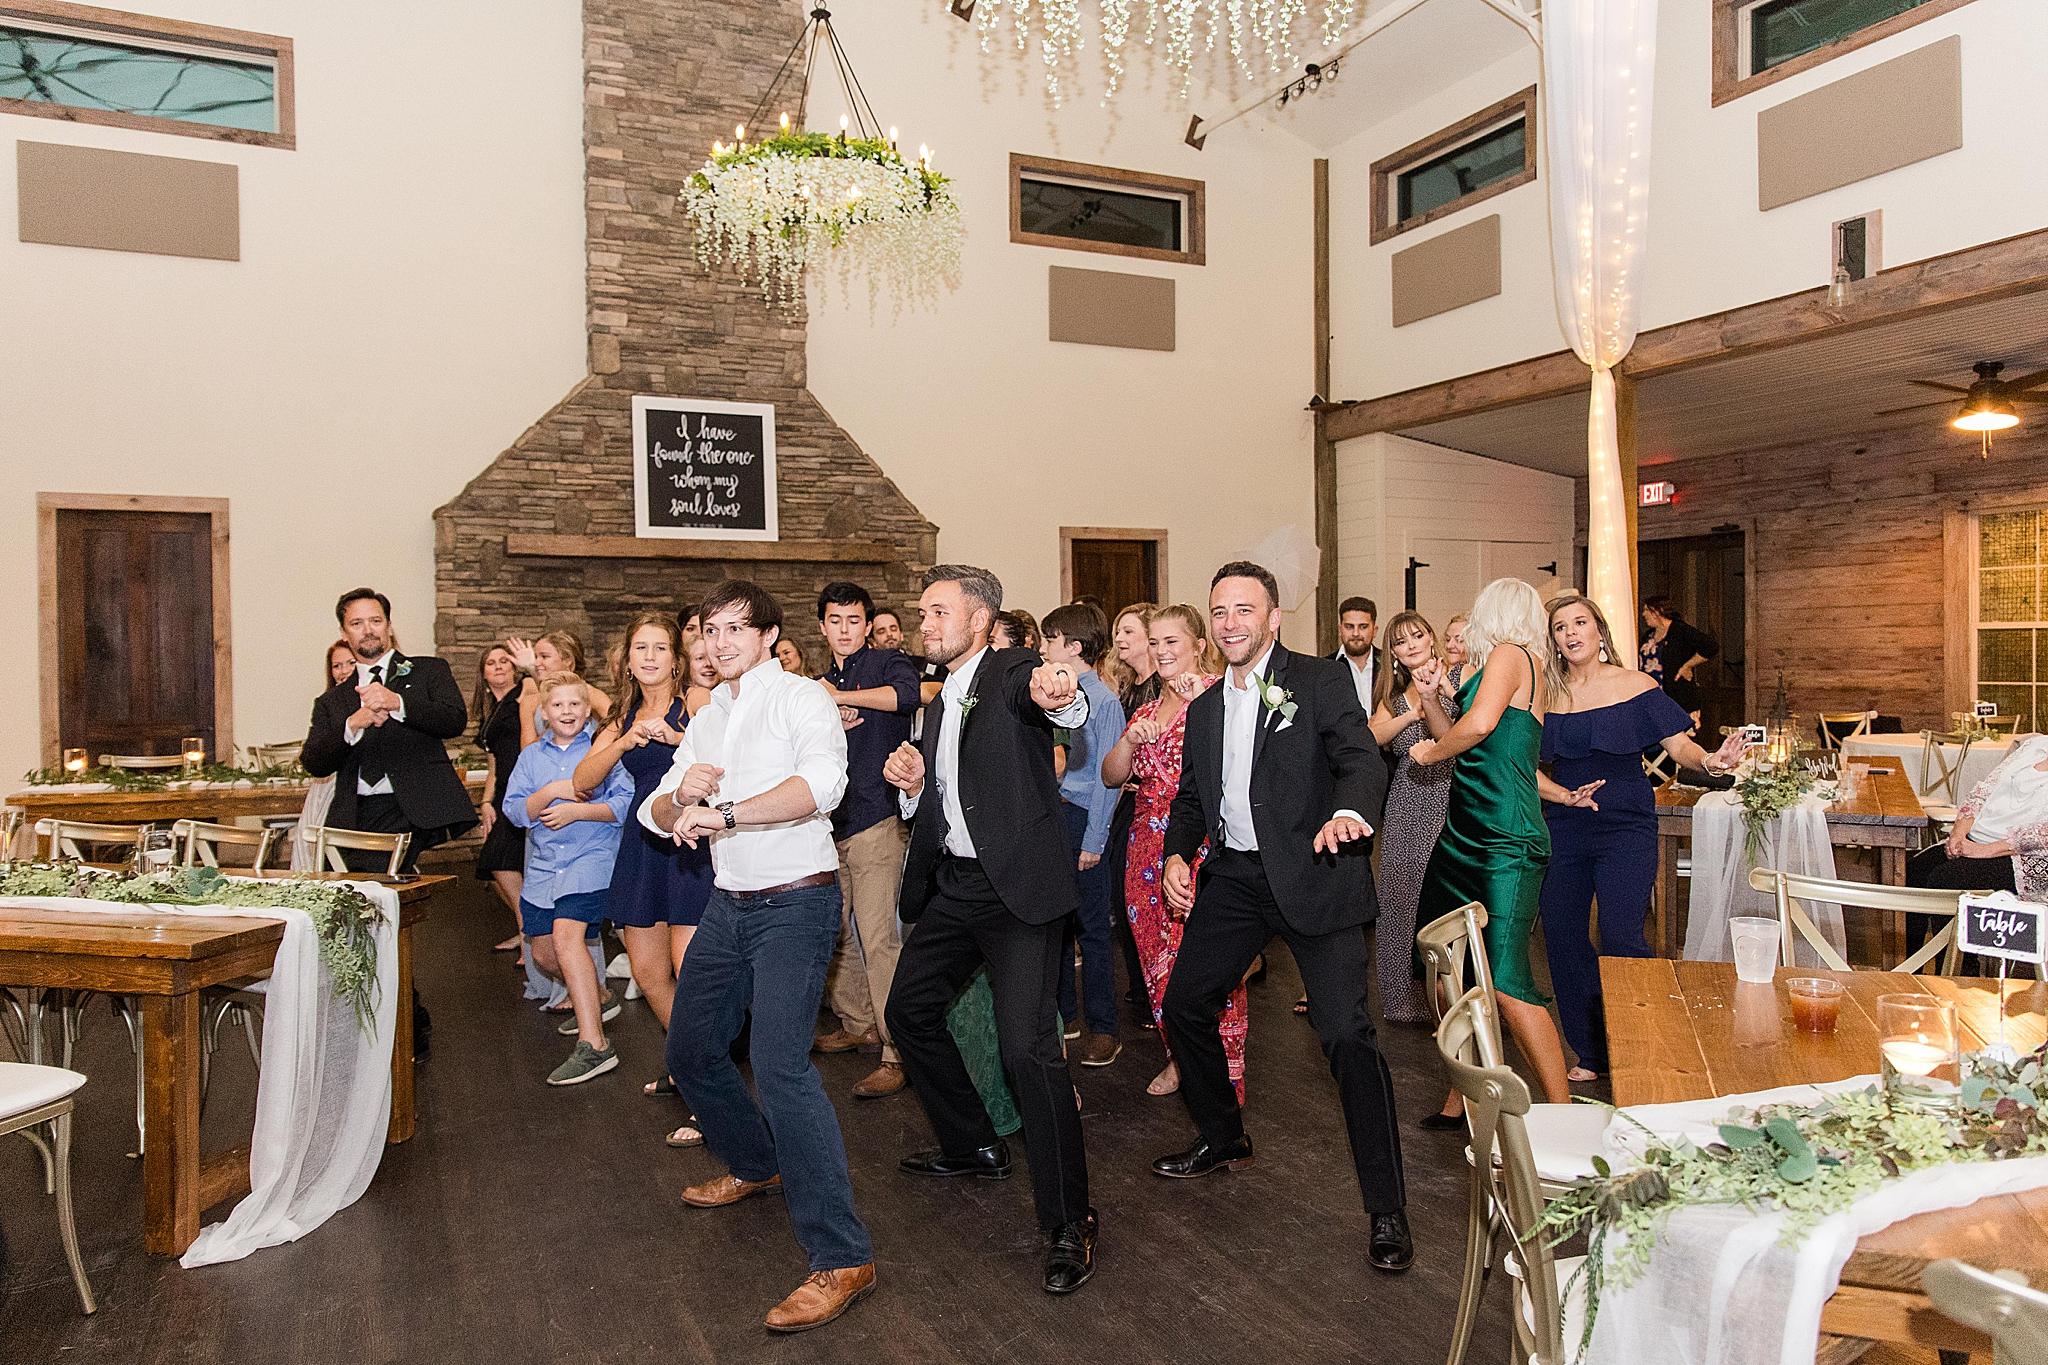 wedding guests dance during AL wedding reception